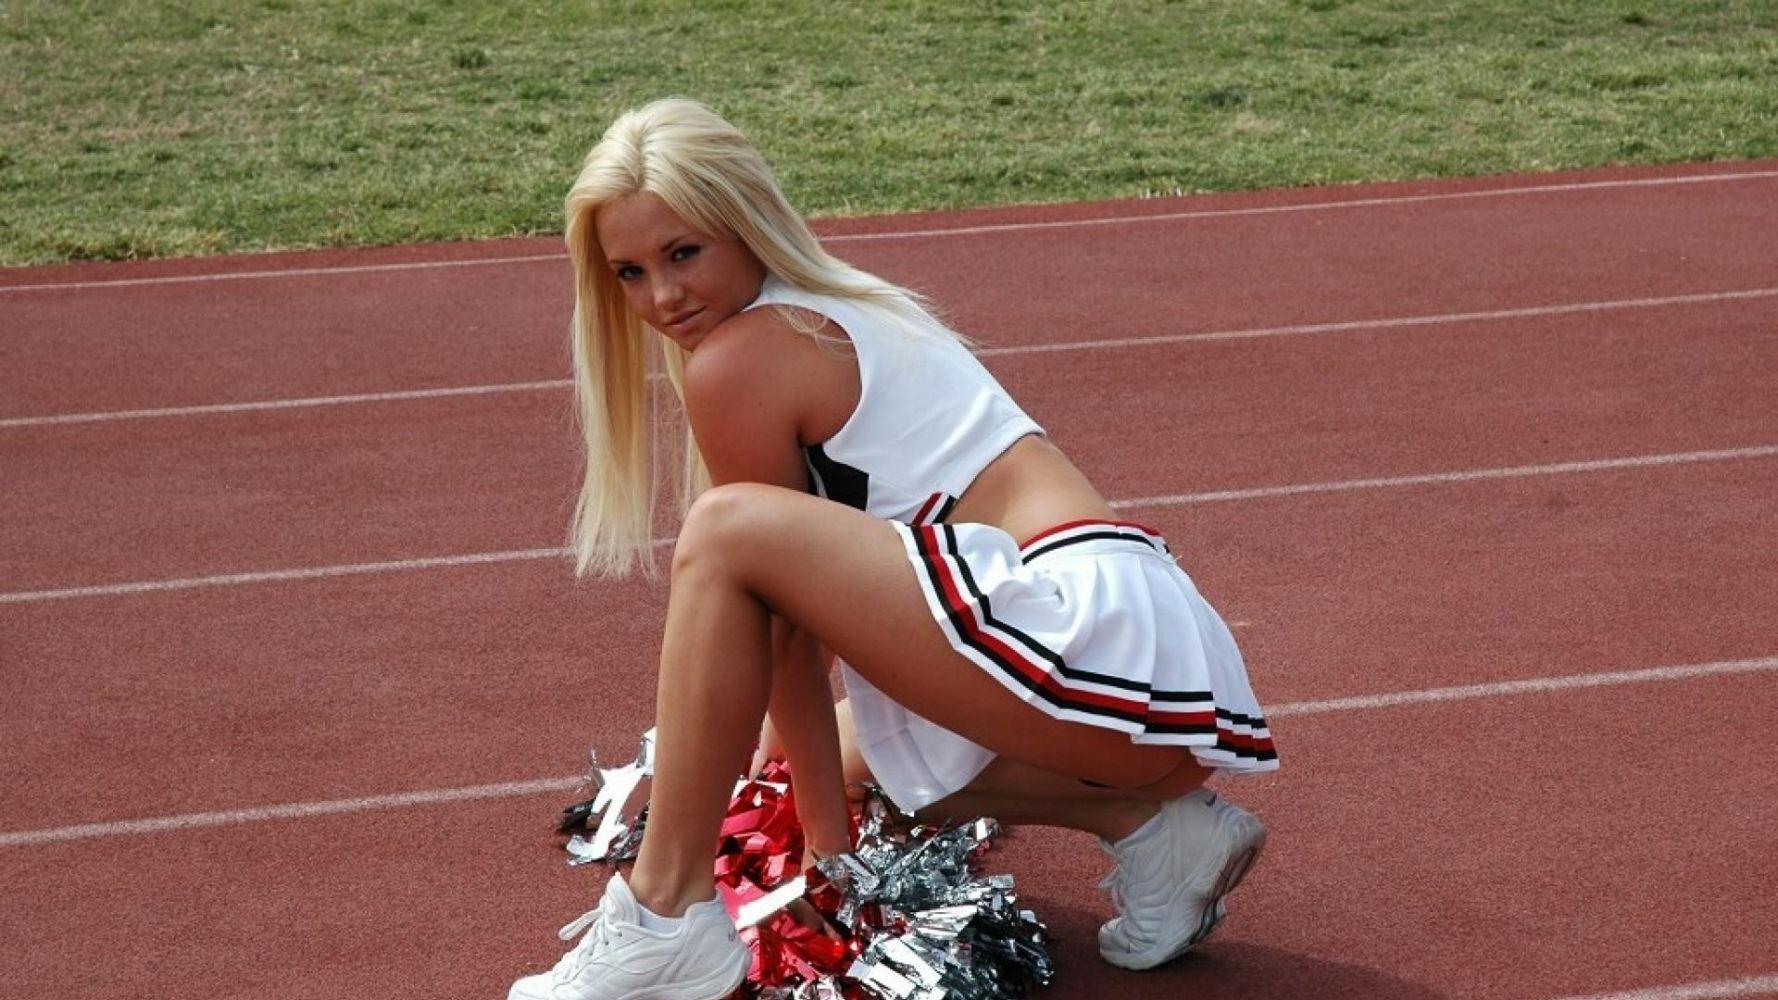 Nba Cheerleaders Present Beauty Of Sports